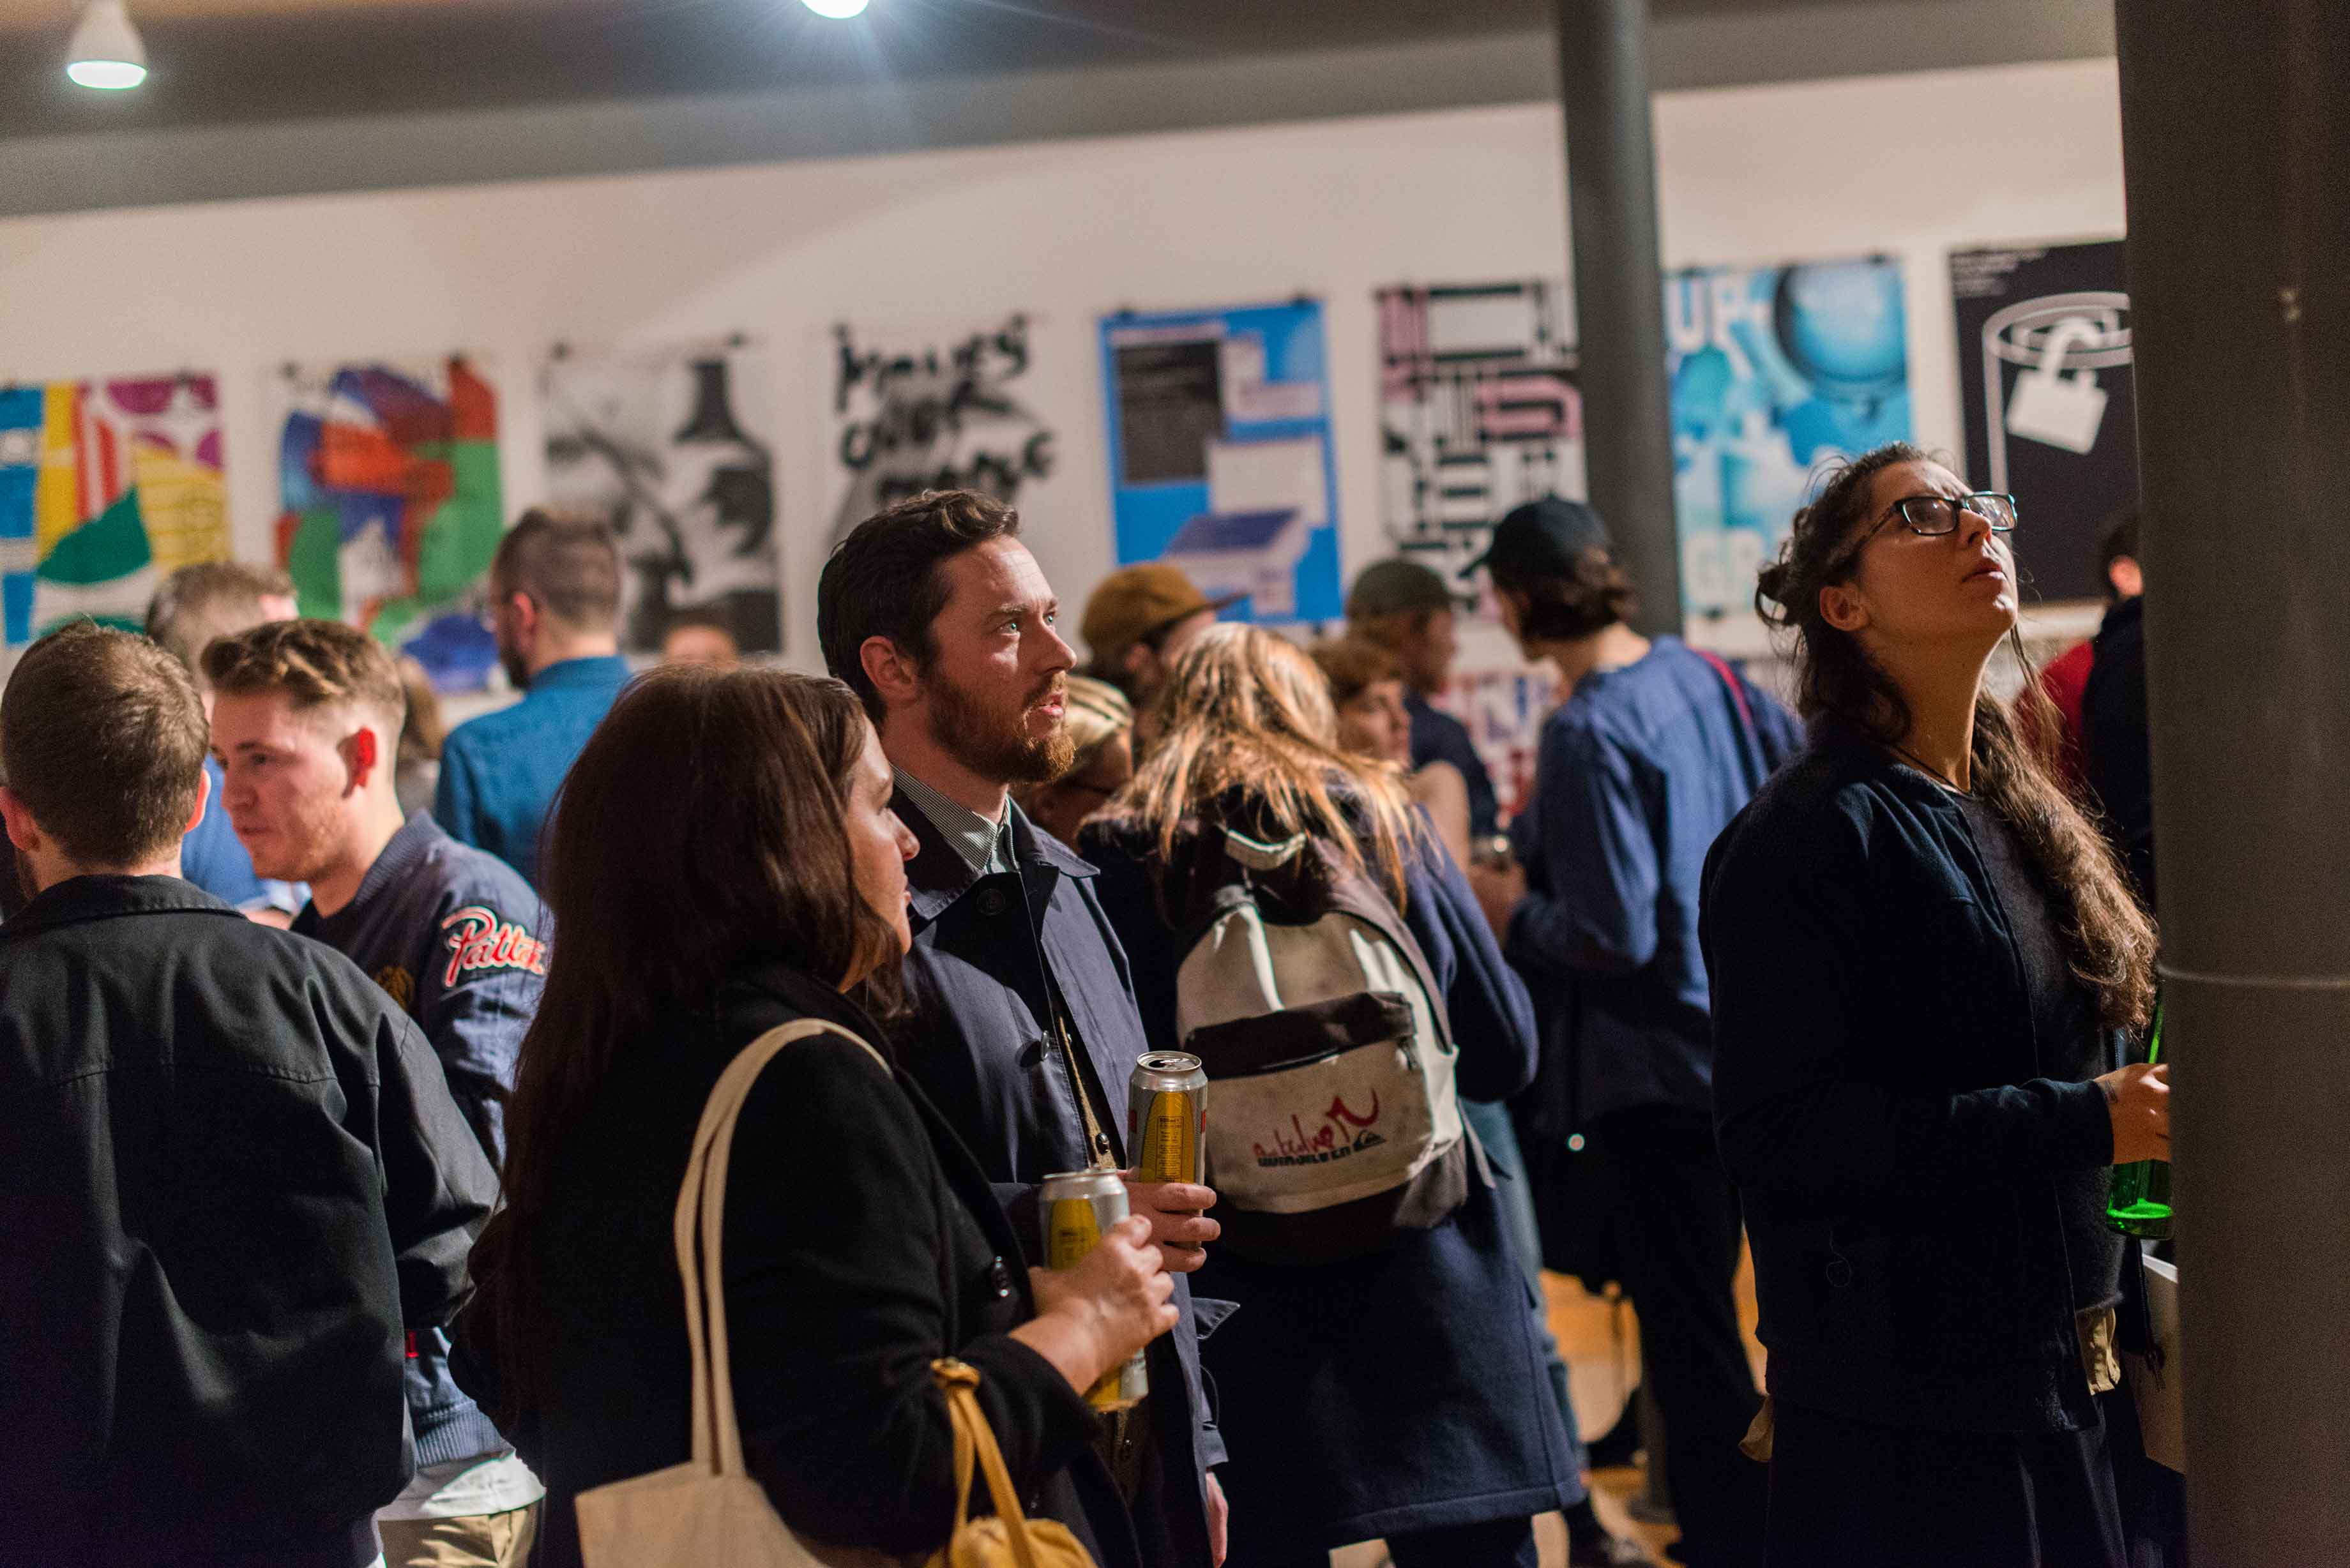 7graphicdesignfestivalscotland-2015-launch